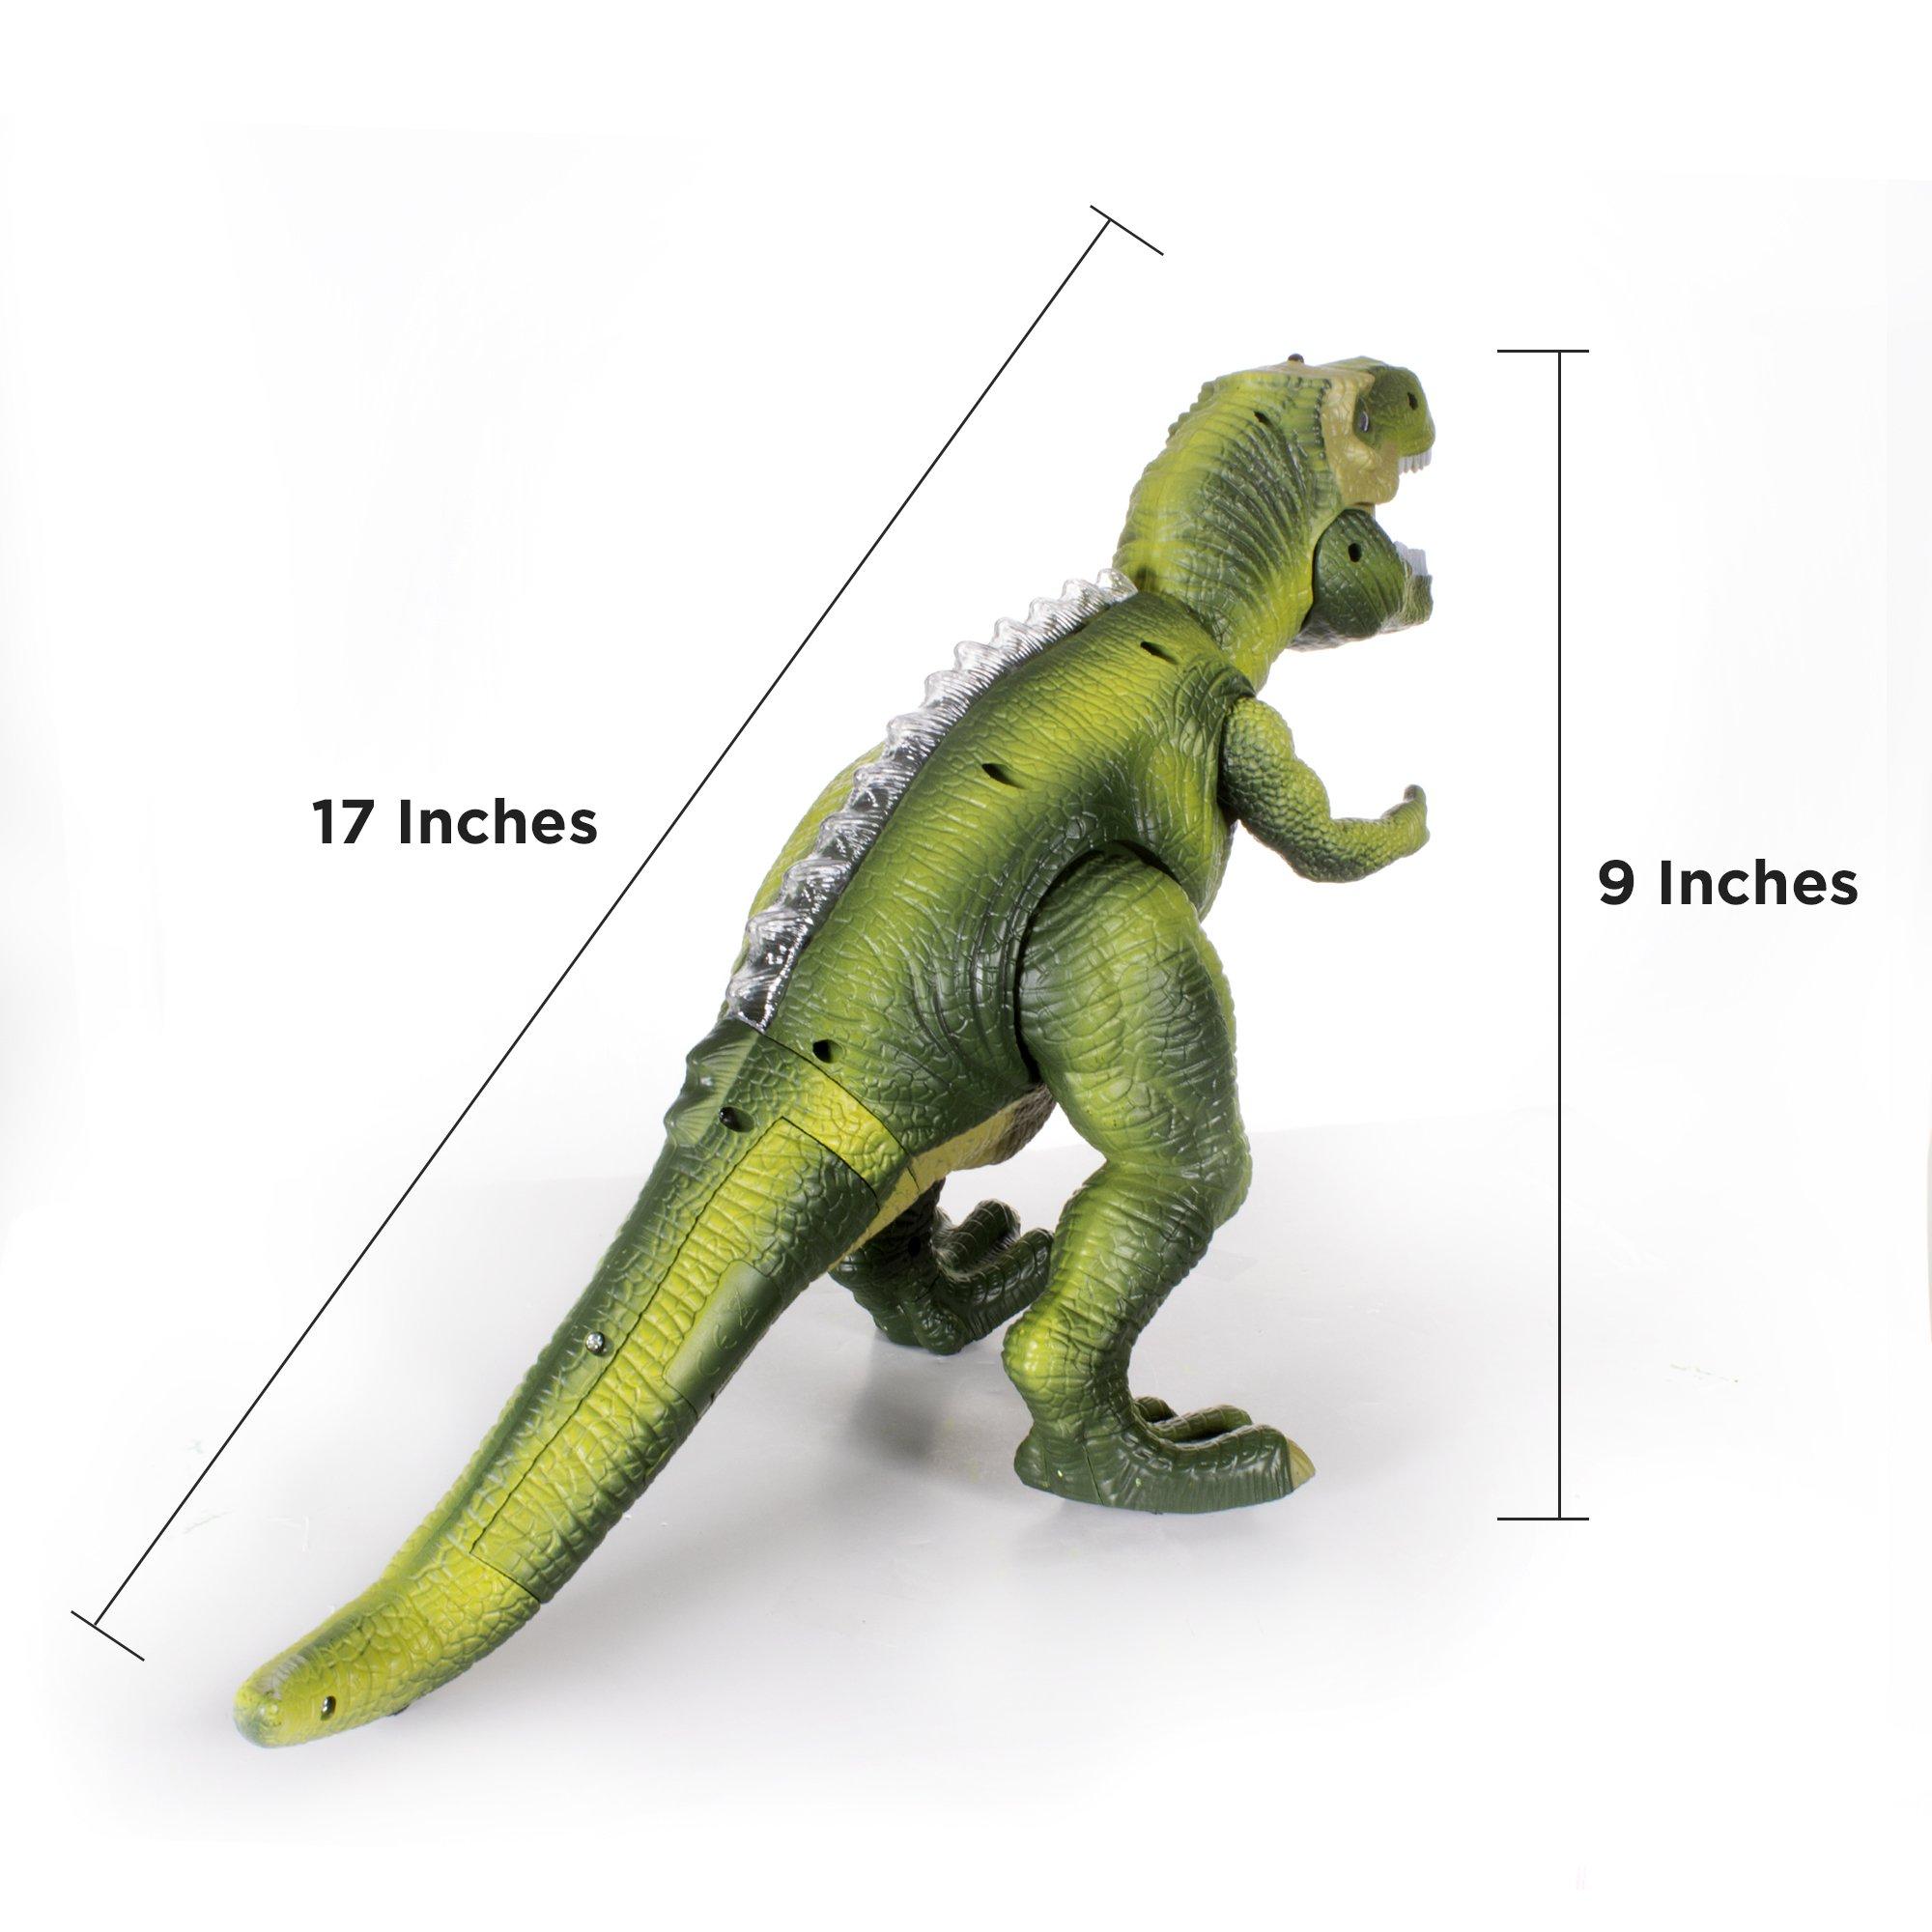 Windy City Novelties Led Light-Up Walking & Roaring T-Rex Dinosaur Toys for Boys & Girls (T-Rex with Remote) by Windy City Novelties (Image #6)